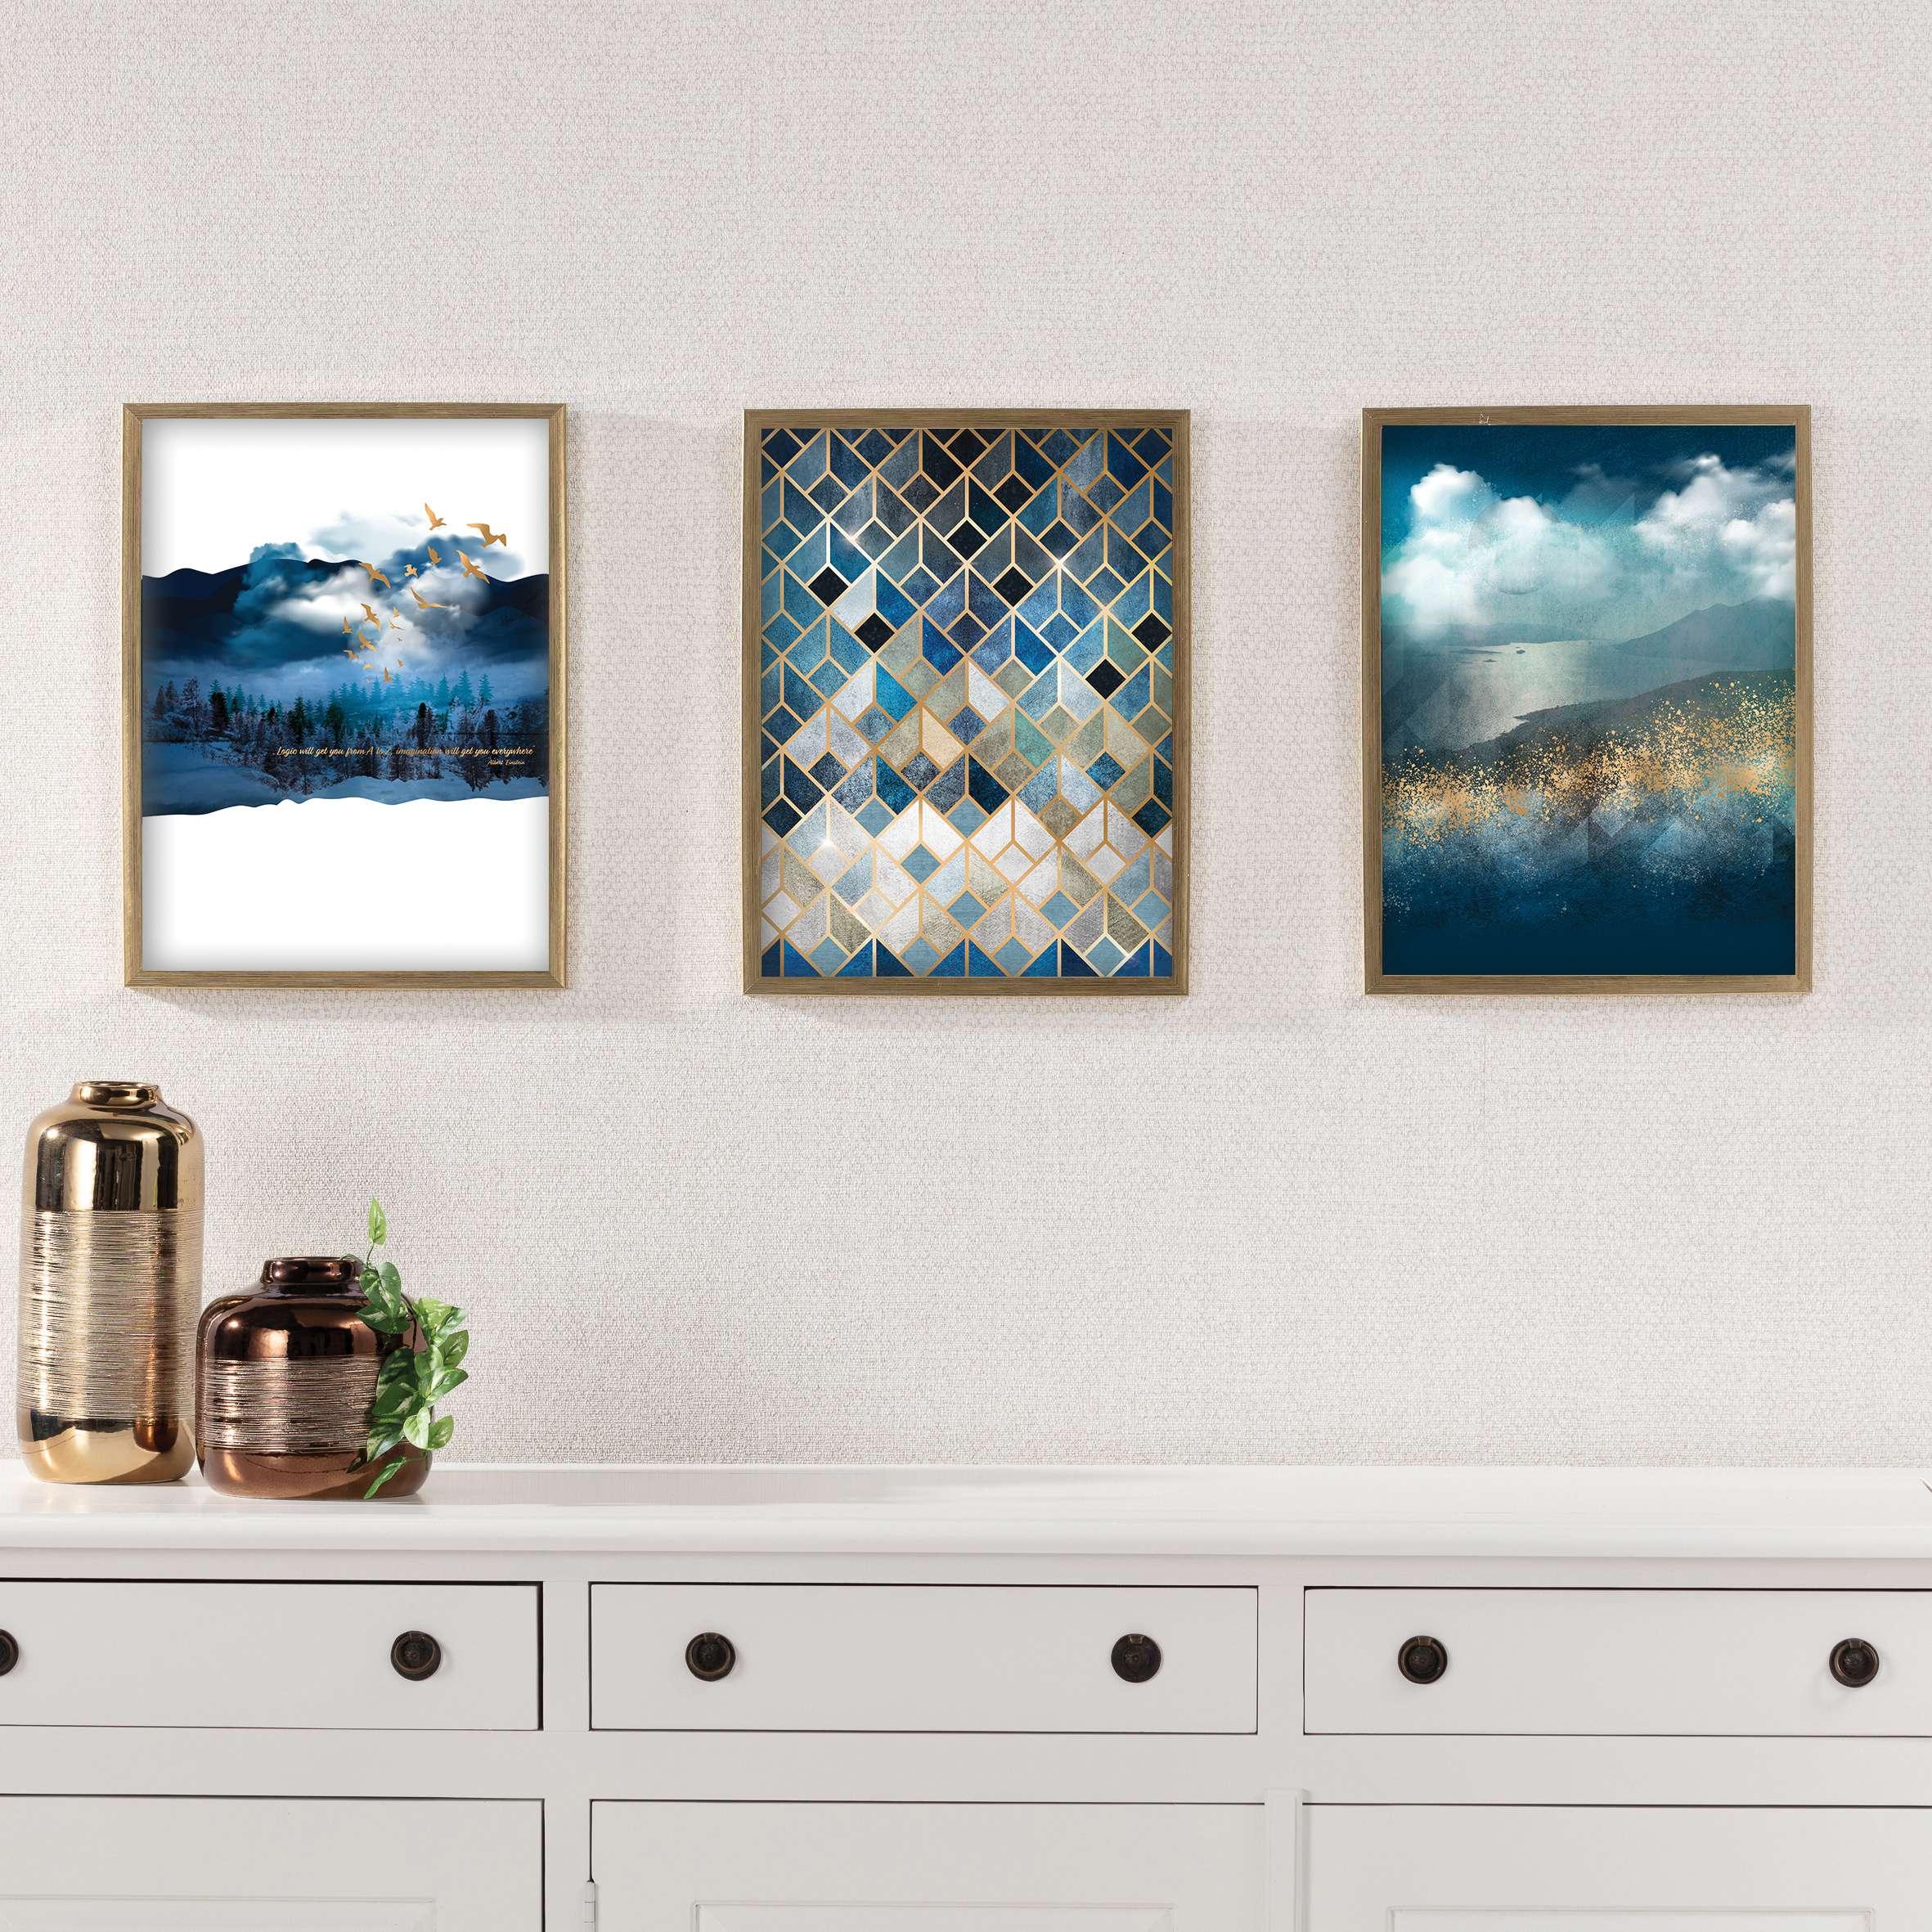 Wandbild Impression 30x40cm gold&navy